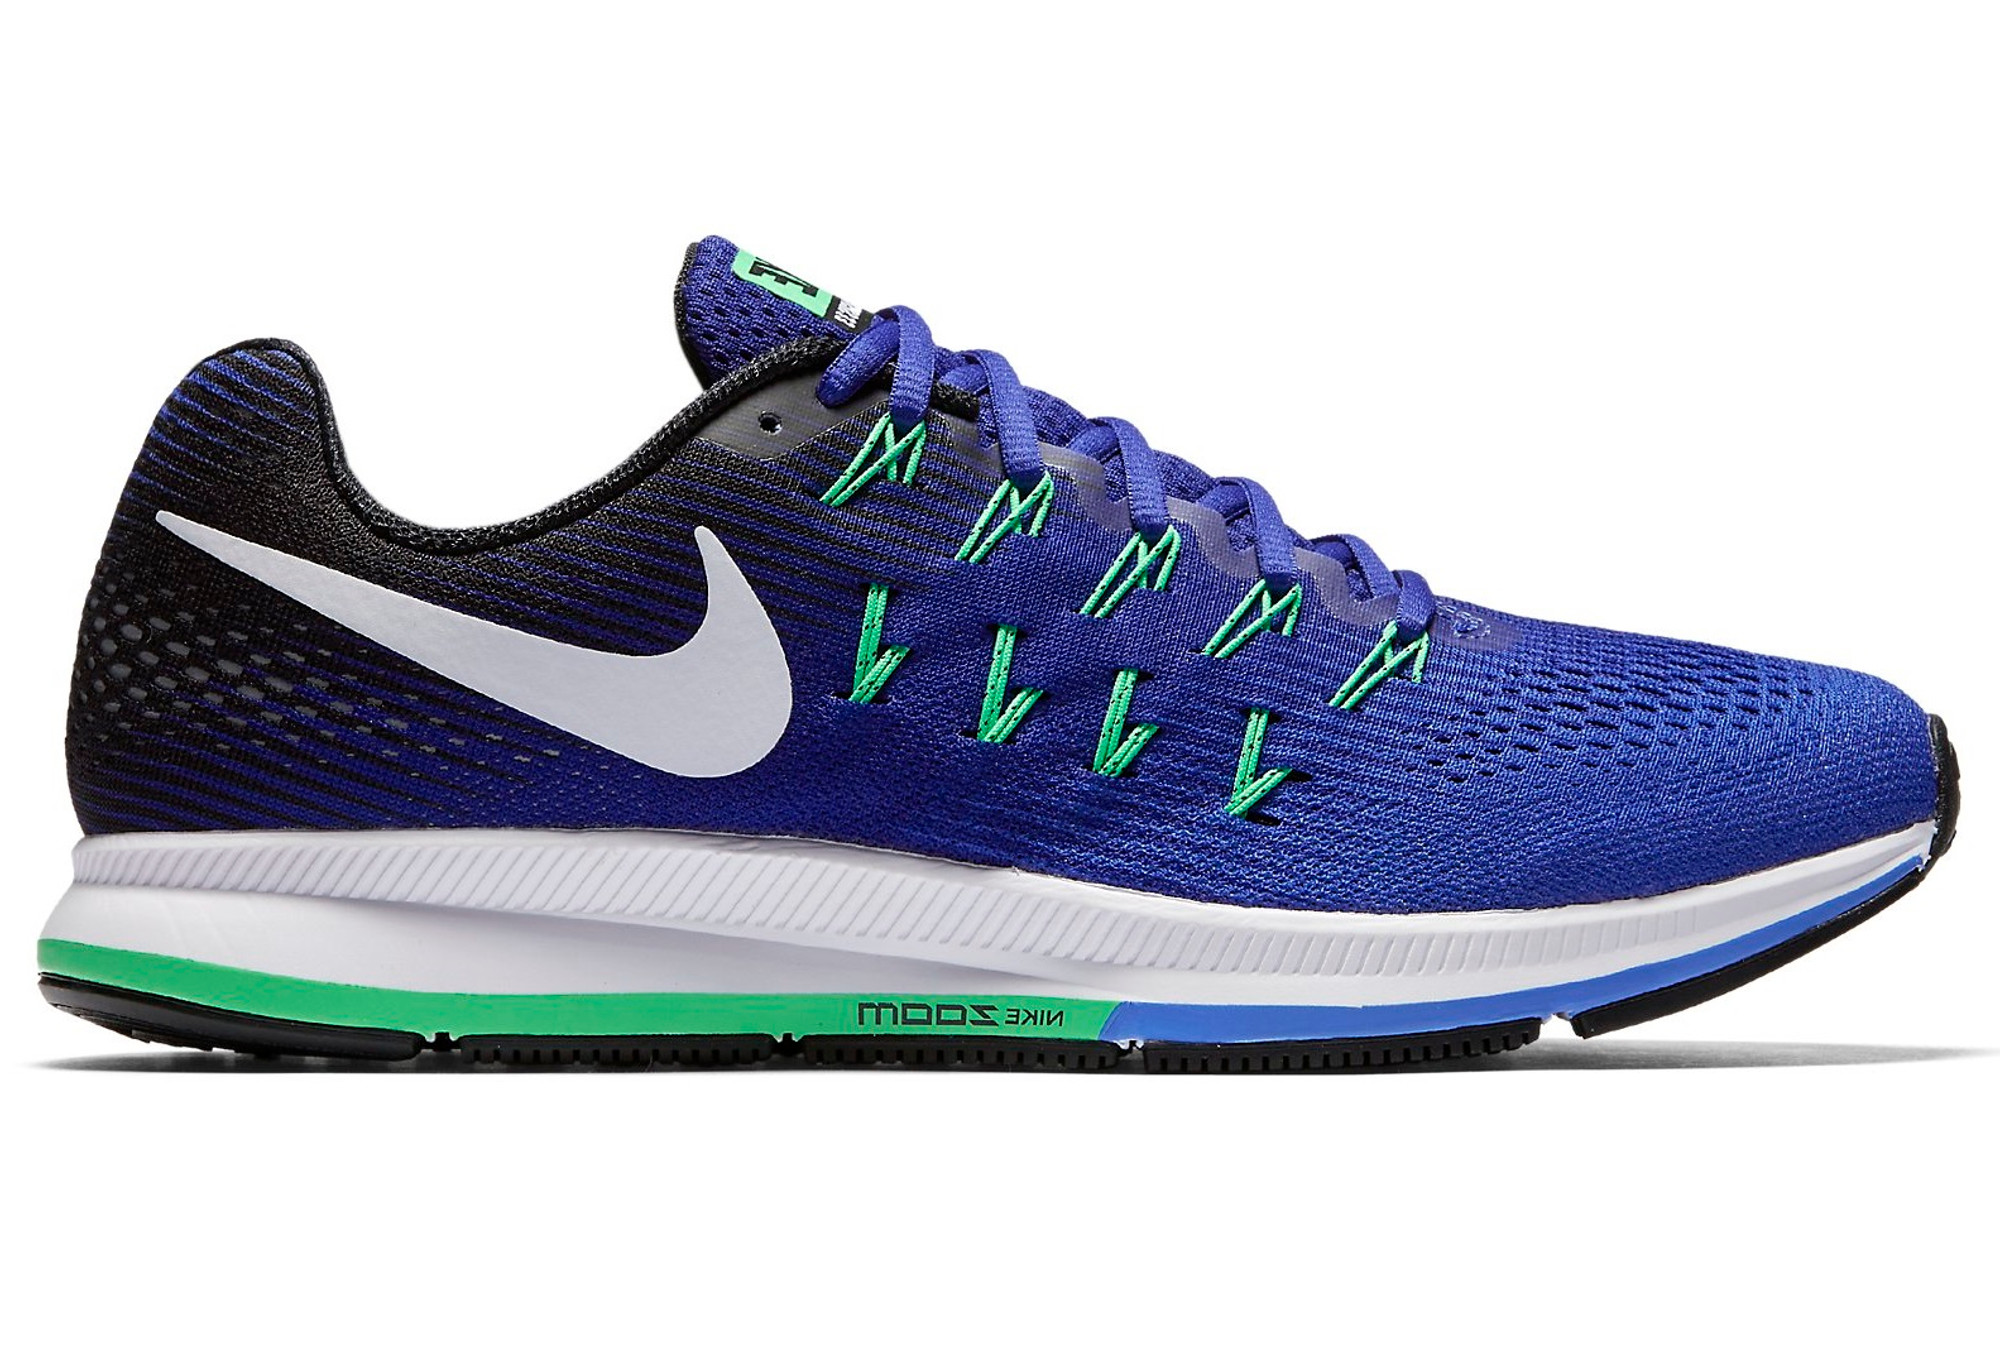 1d891d37 Zapatillas Nike AIR ZOOM PEGASUS 33 para Hombre Azul | Alltricks.es